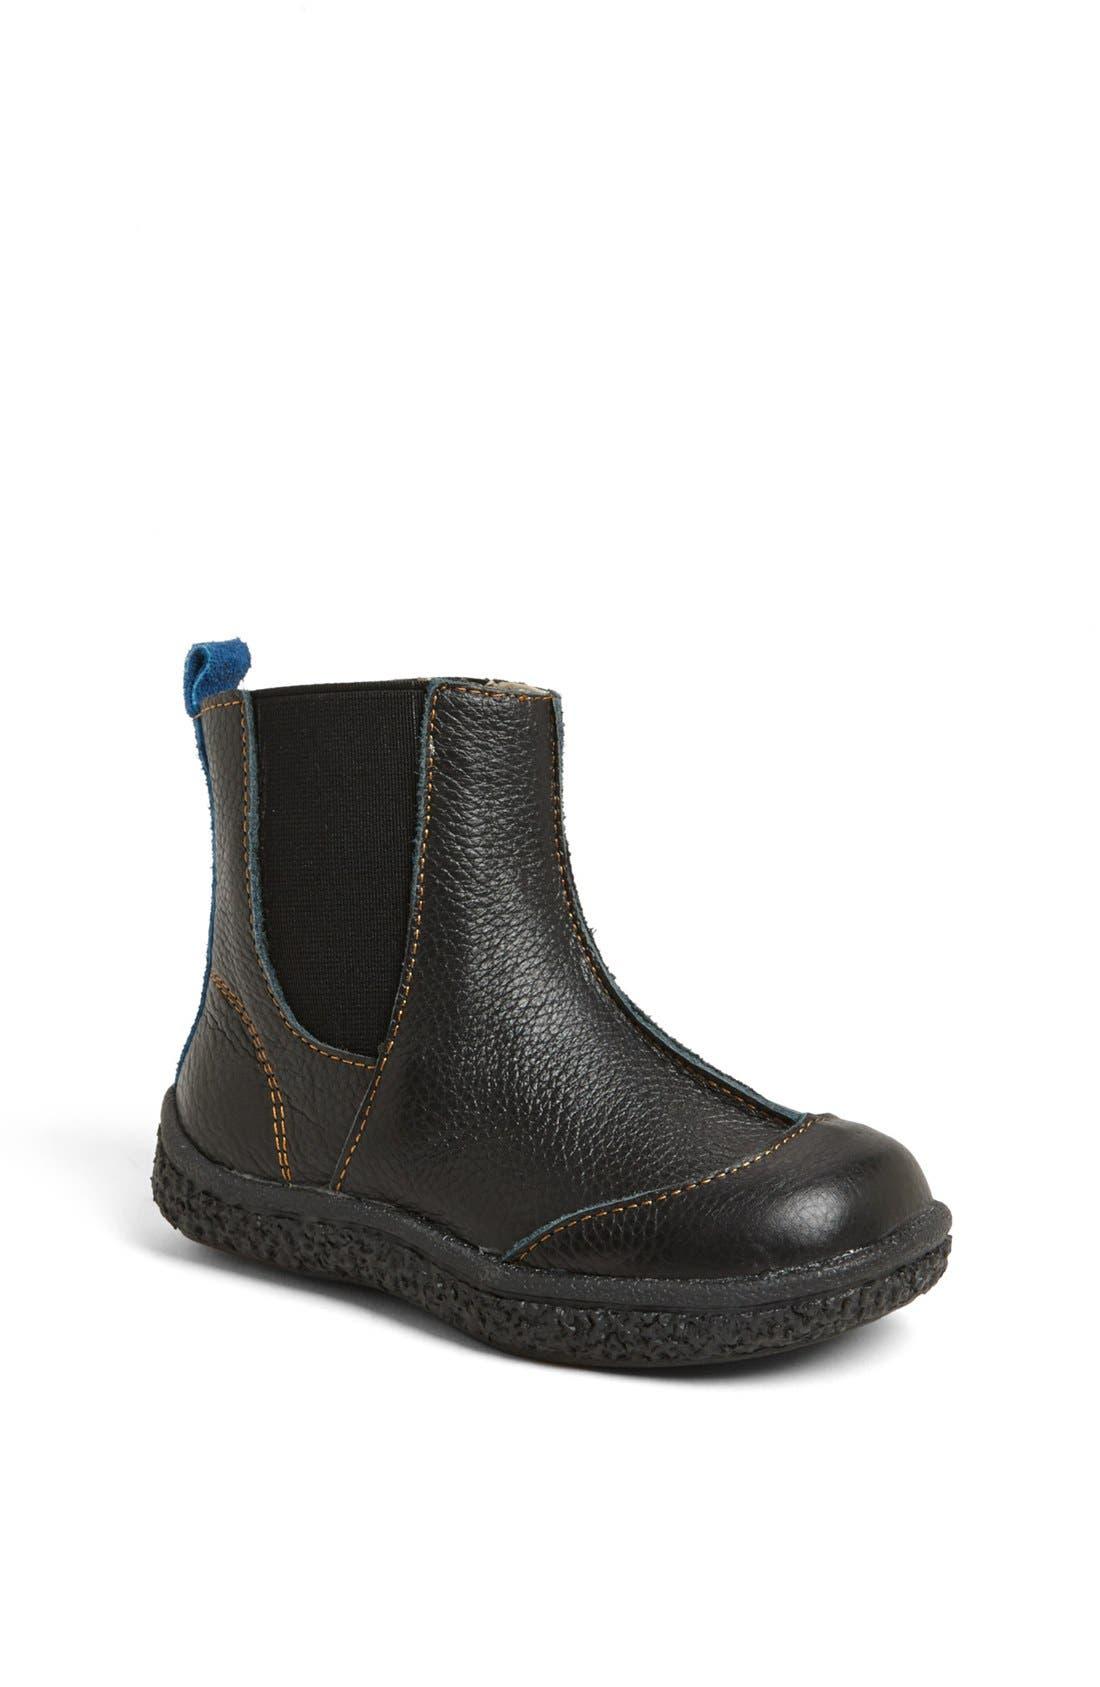 Alternate Image 1 Selected - See Kai Run 'Mateo' Boot (Toddler & Little Kid)